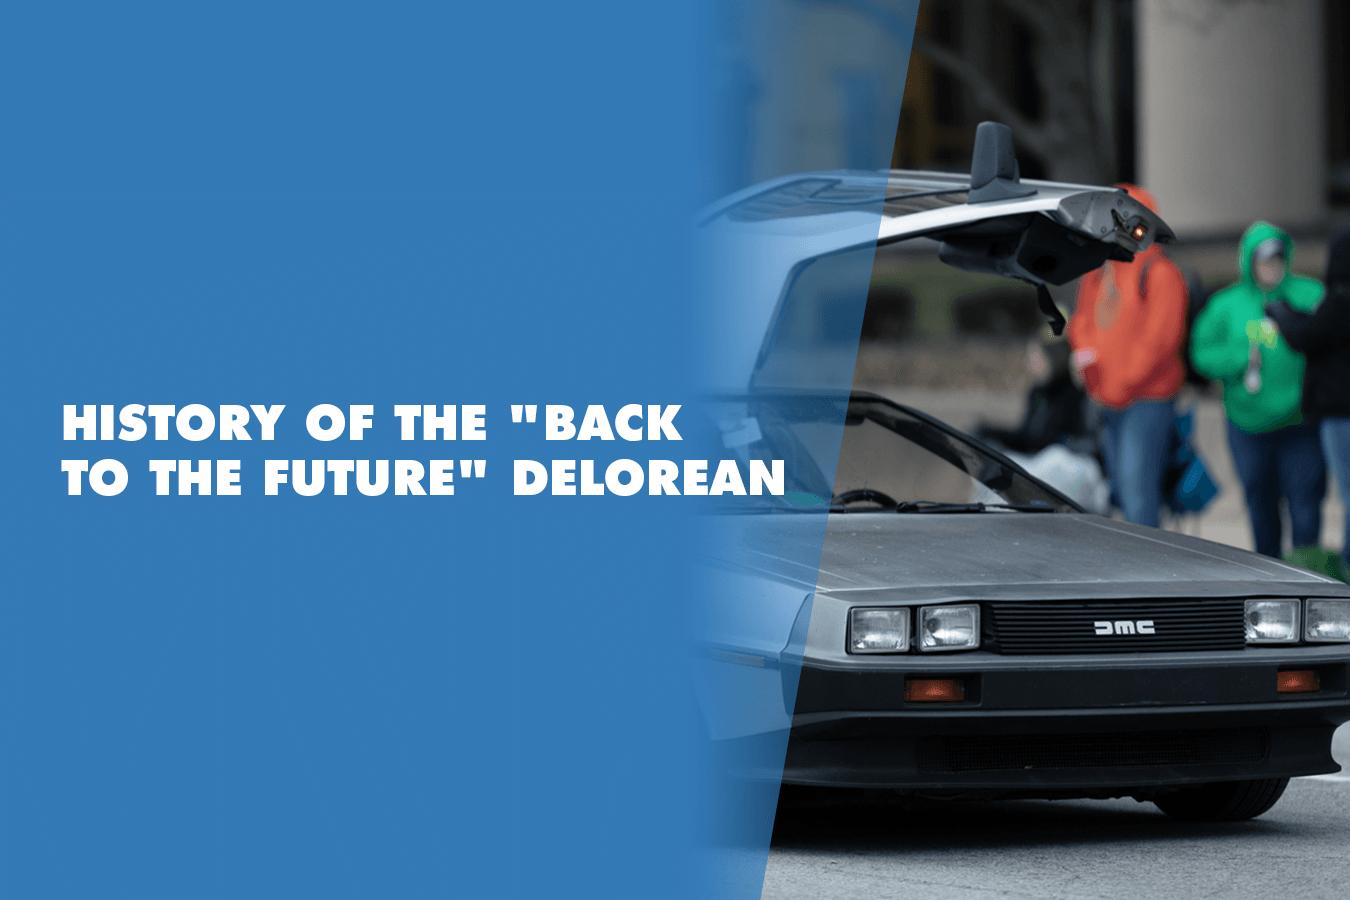 history of the back to the future DeLorean